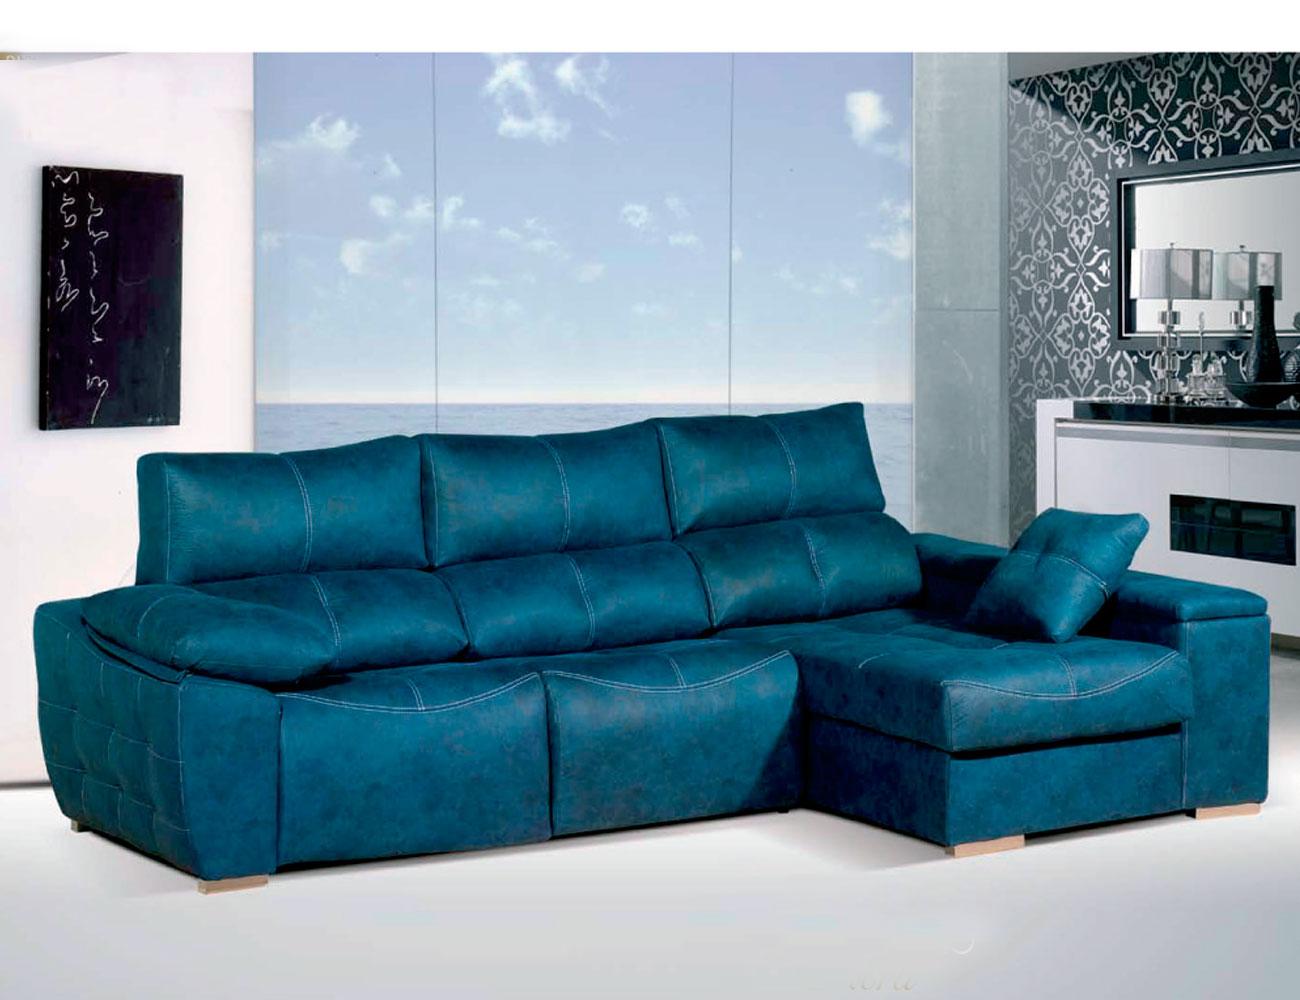 Sofa chaiselongue relax 2 motores anti manchas turquesa13